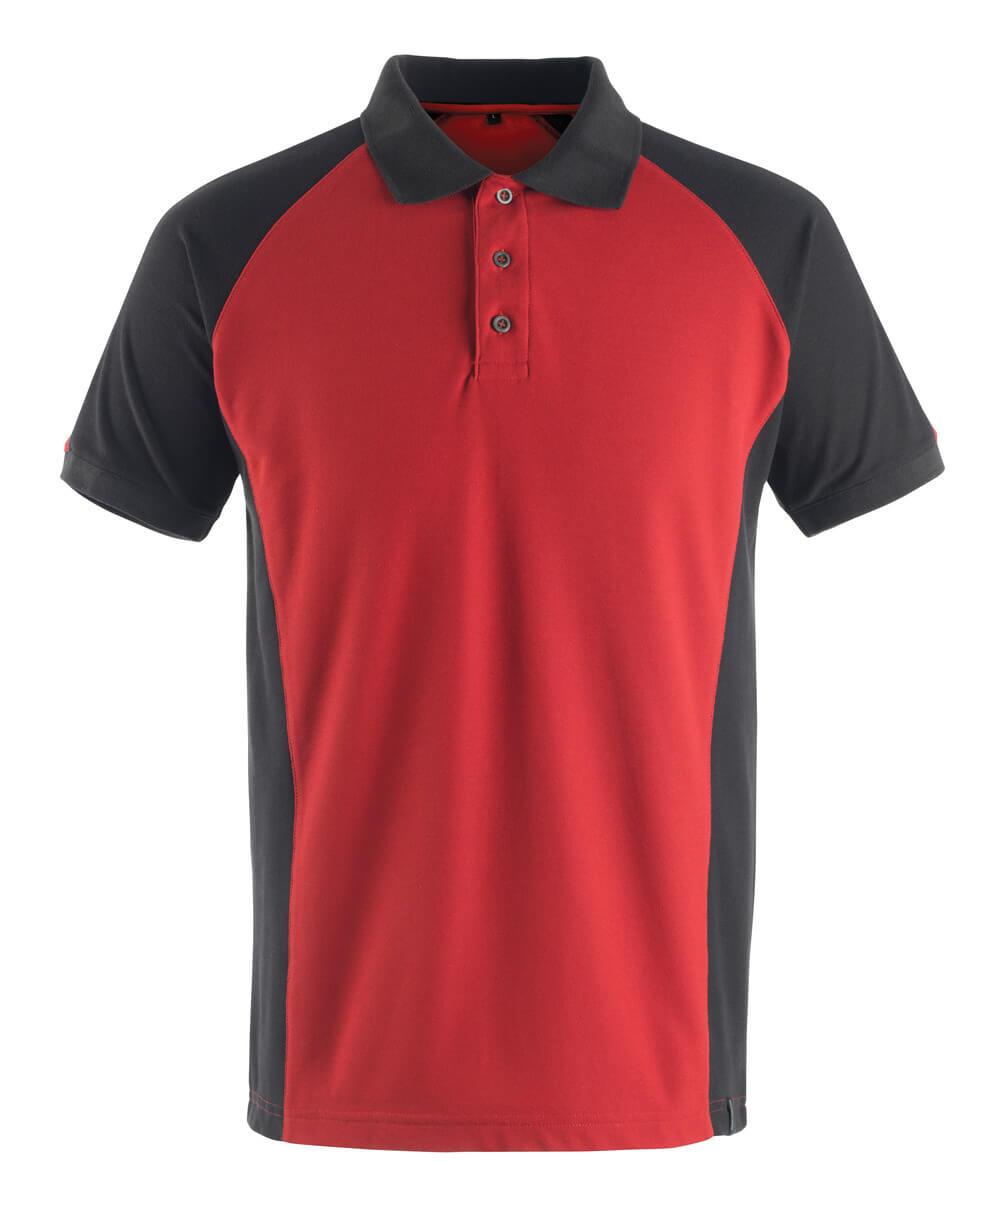 50569-961-0209 Polo-Shirt - Rot/Schwarz